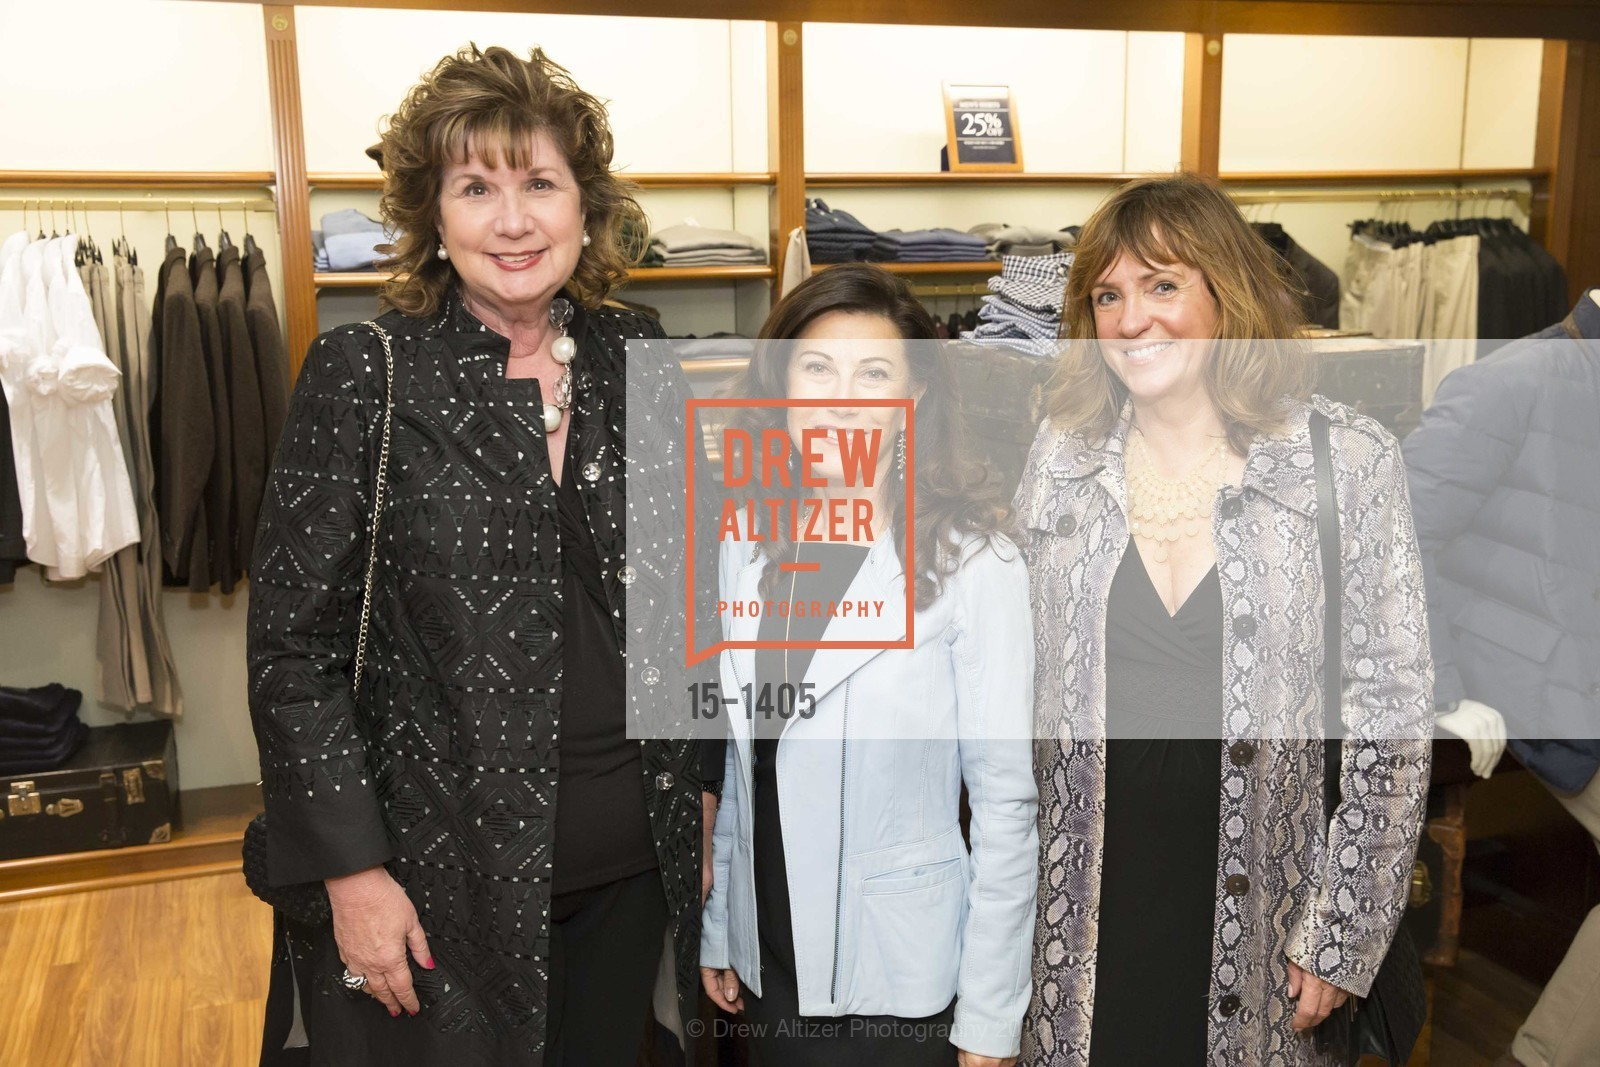 Pam Glogau, Adrienne Mally, Dana Capiello, Photo #15-1405